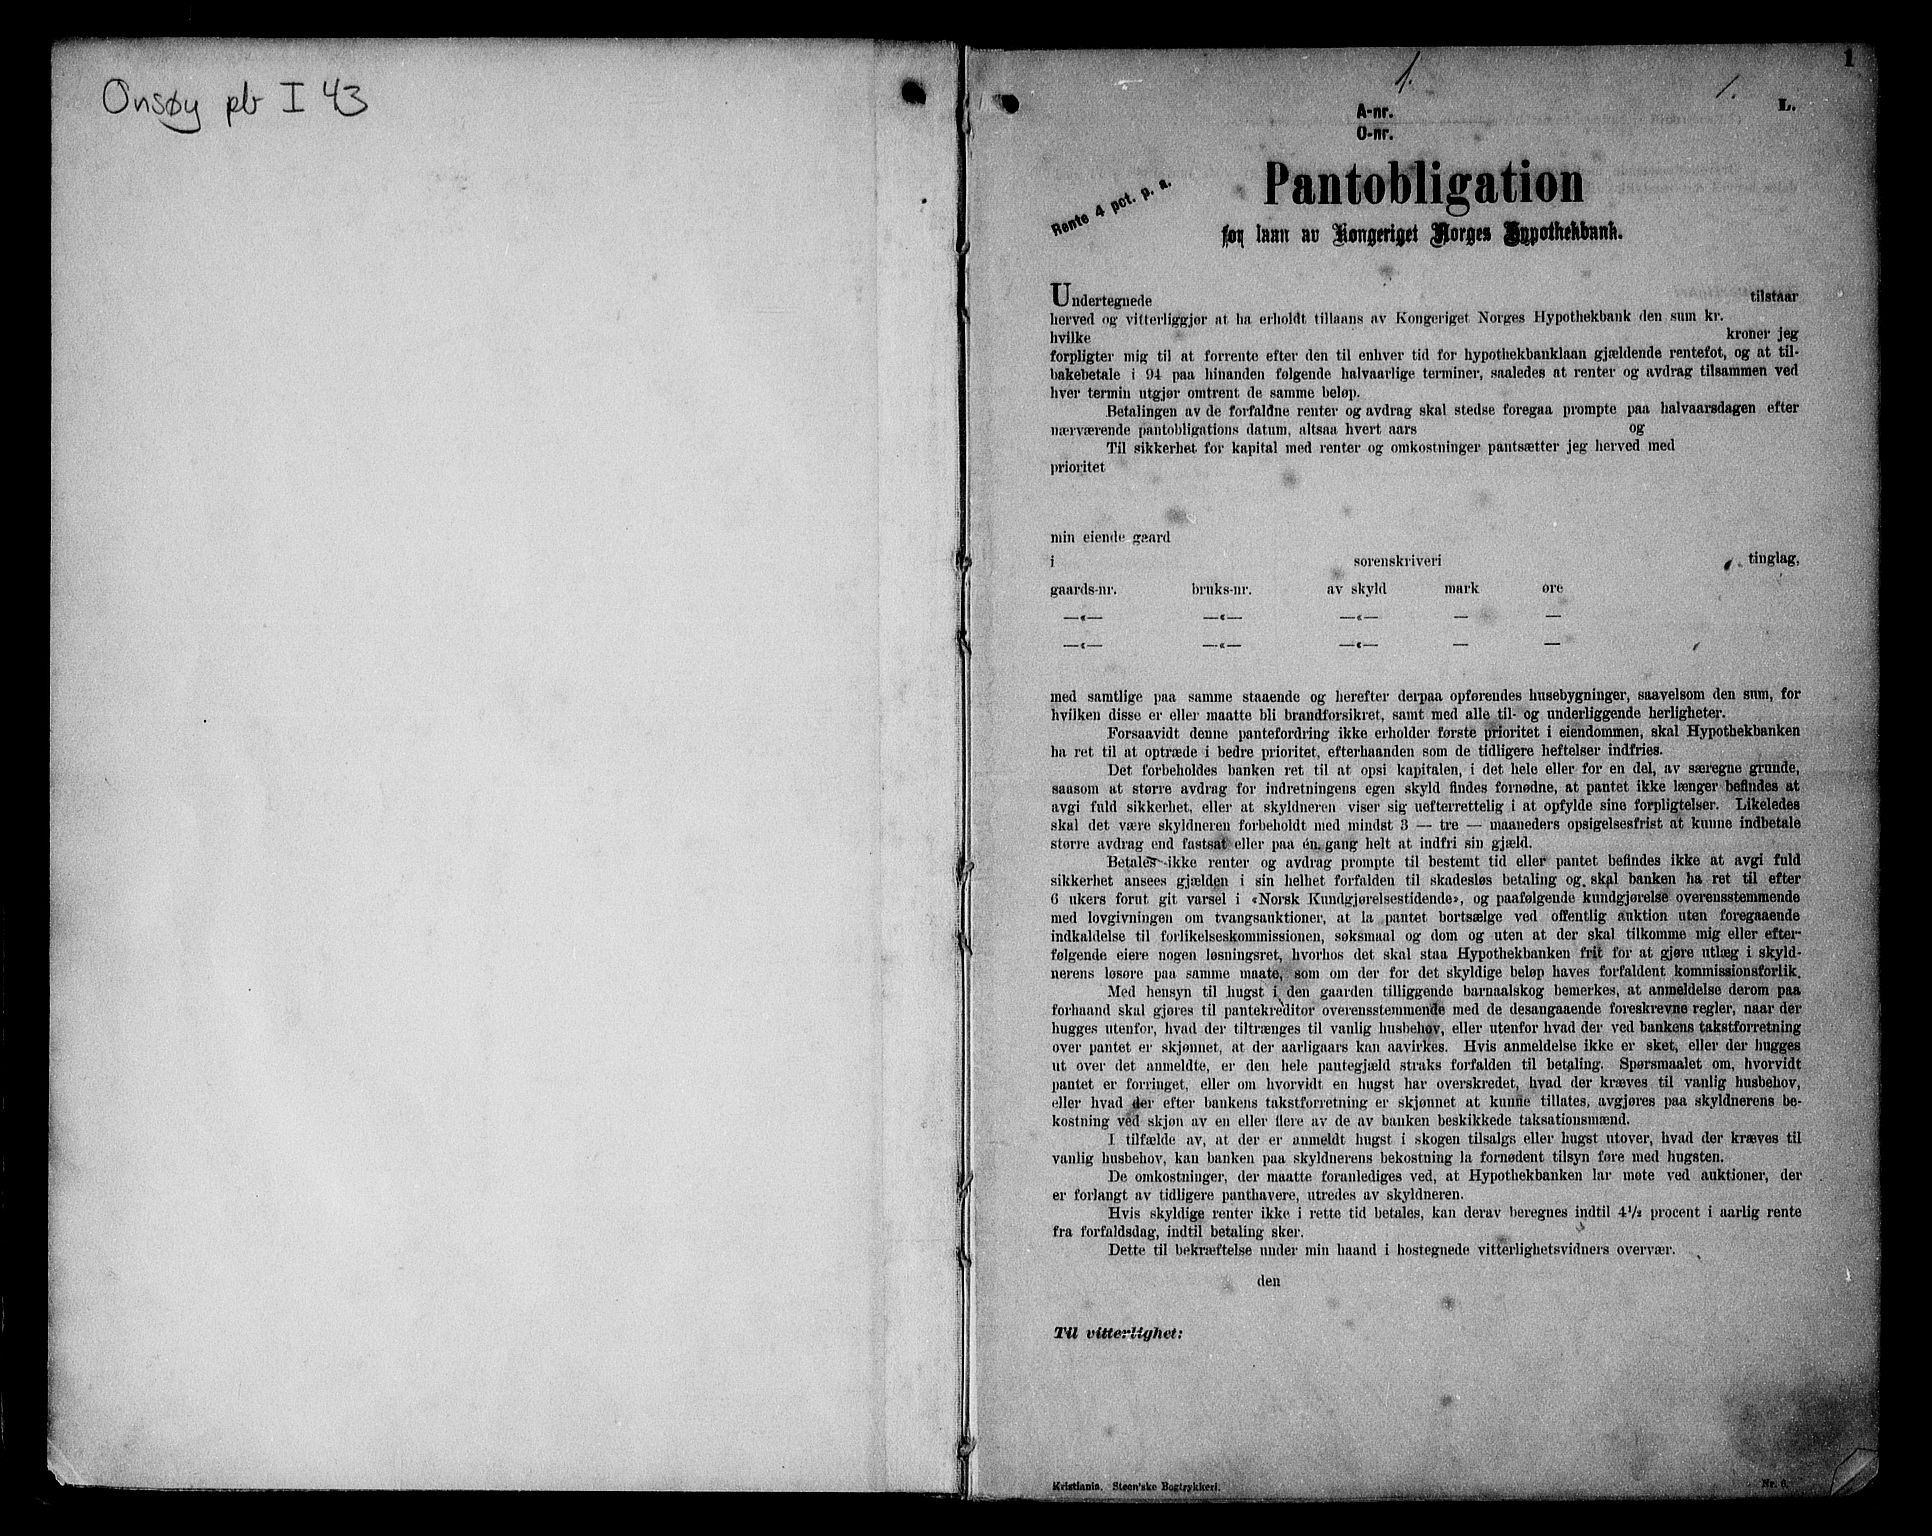 SAO, Onsøy sorenskriveri, G/Ga/Gaa/L0043: Pantebok nr. I 43, 1913-1914, s. 1